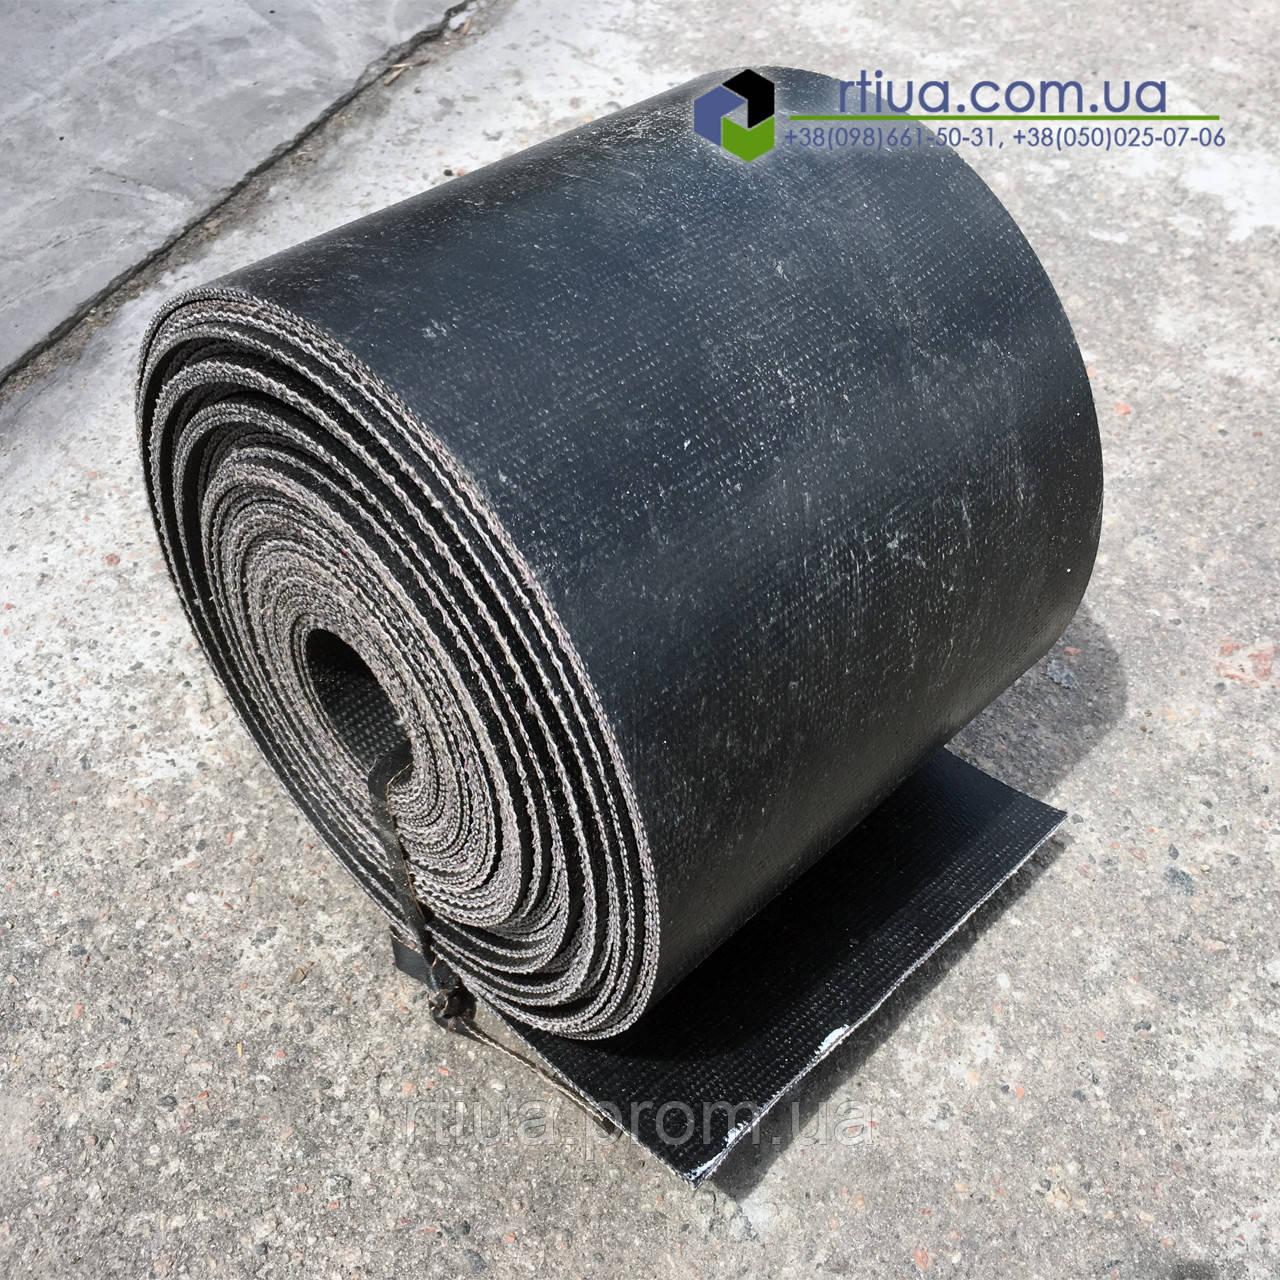 Транспортерная лента ТК-200, 1200х6 - 6/2 (14 мм)